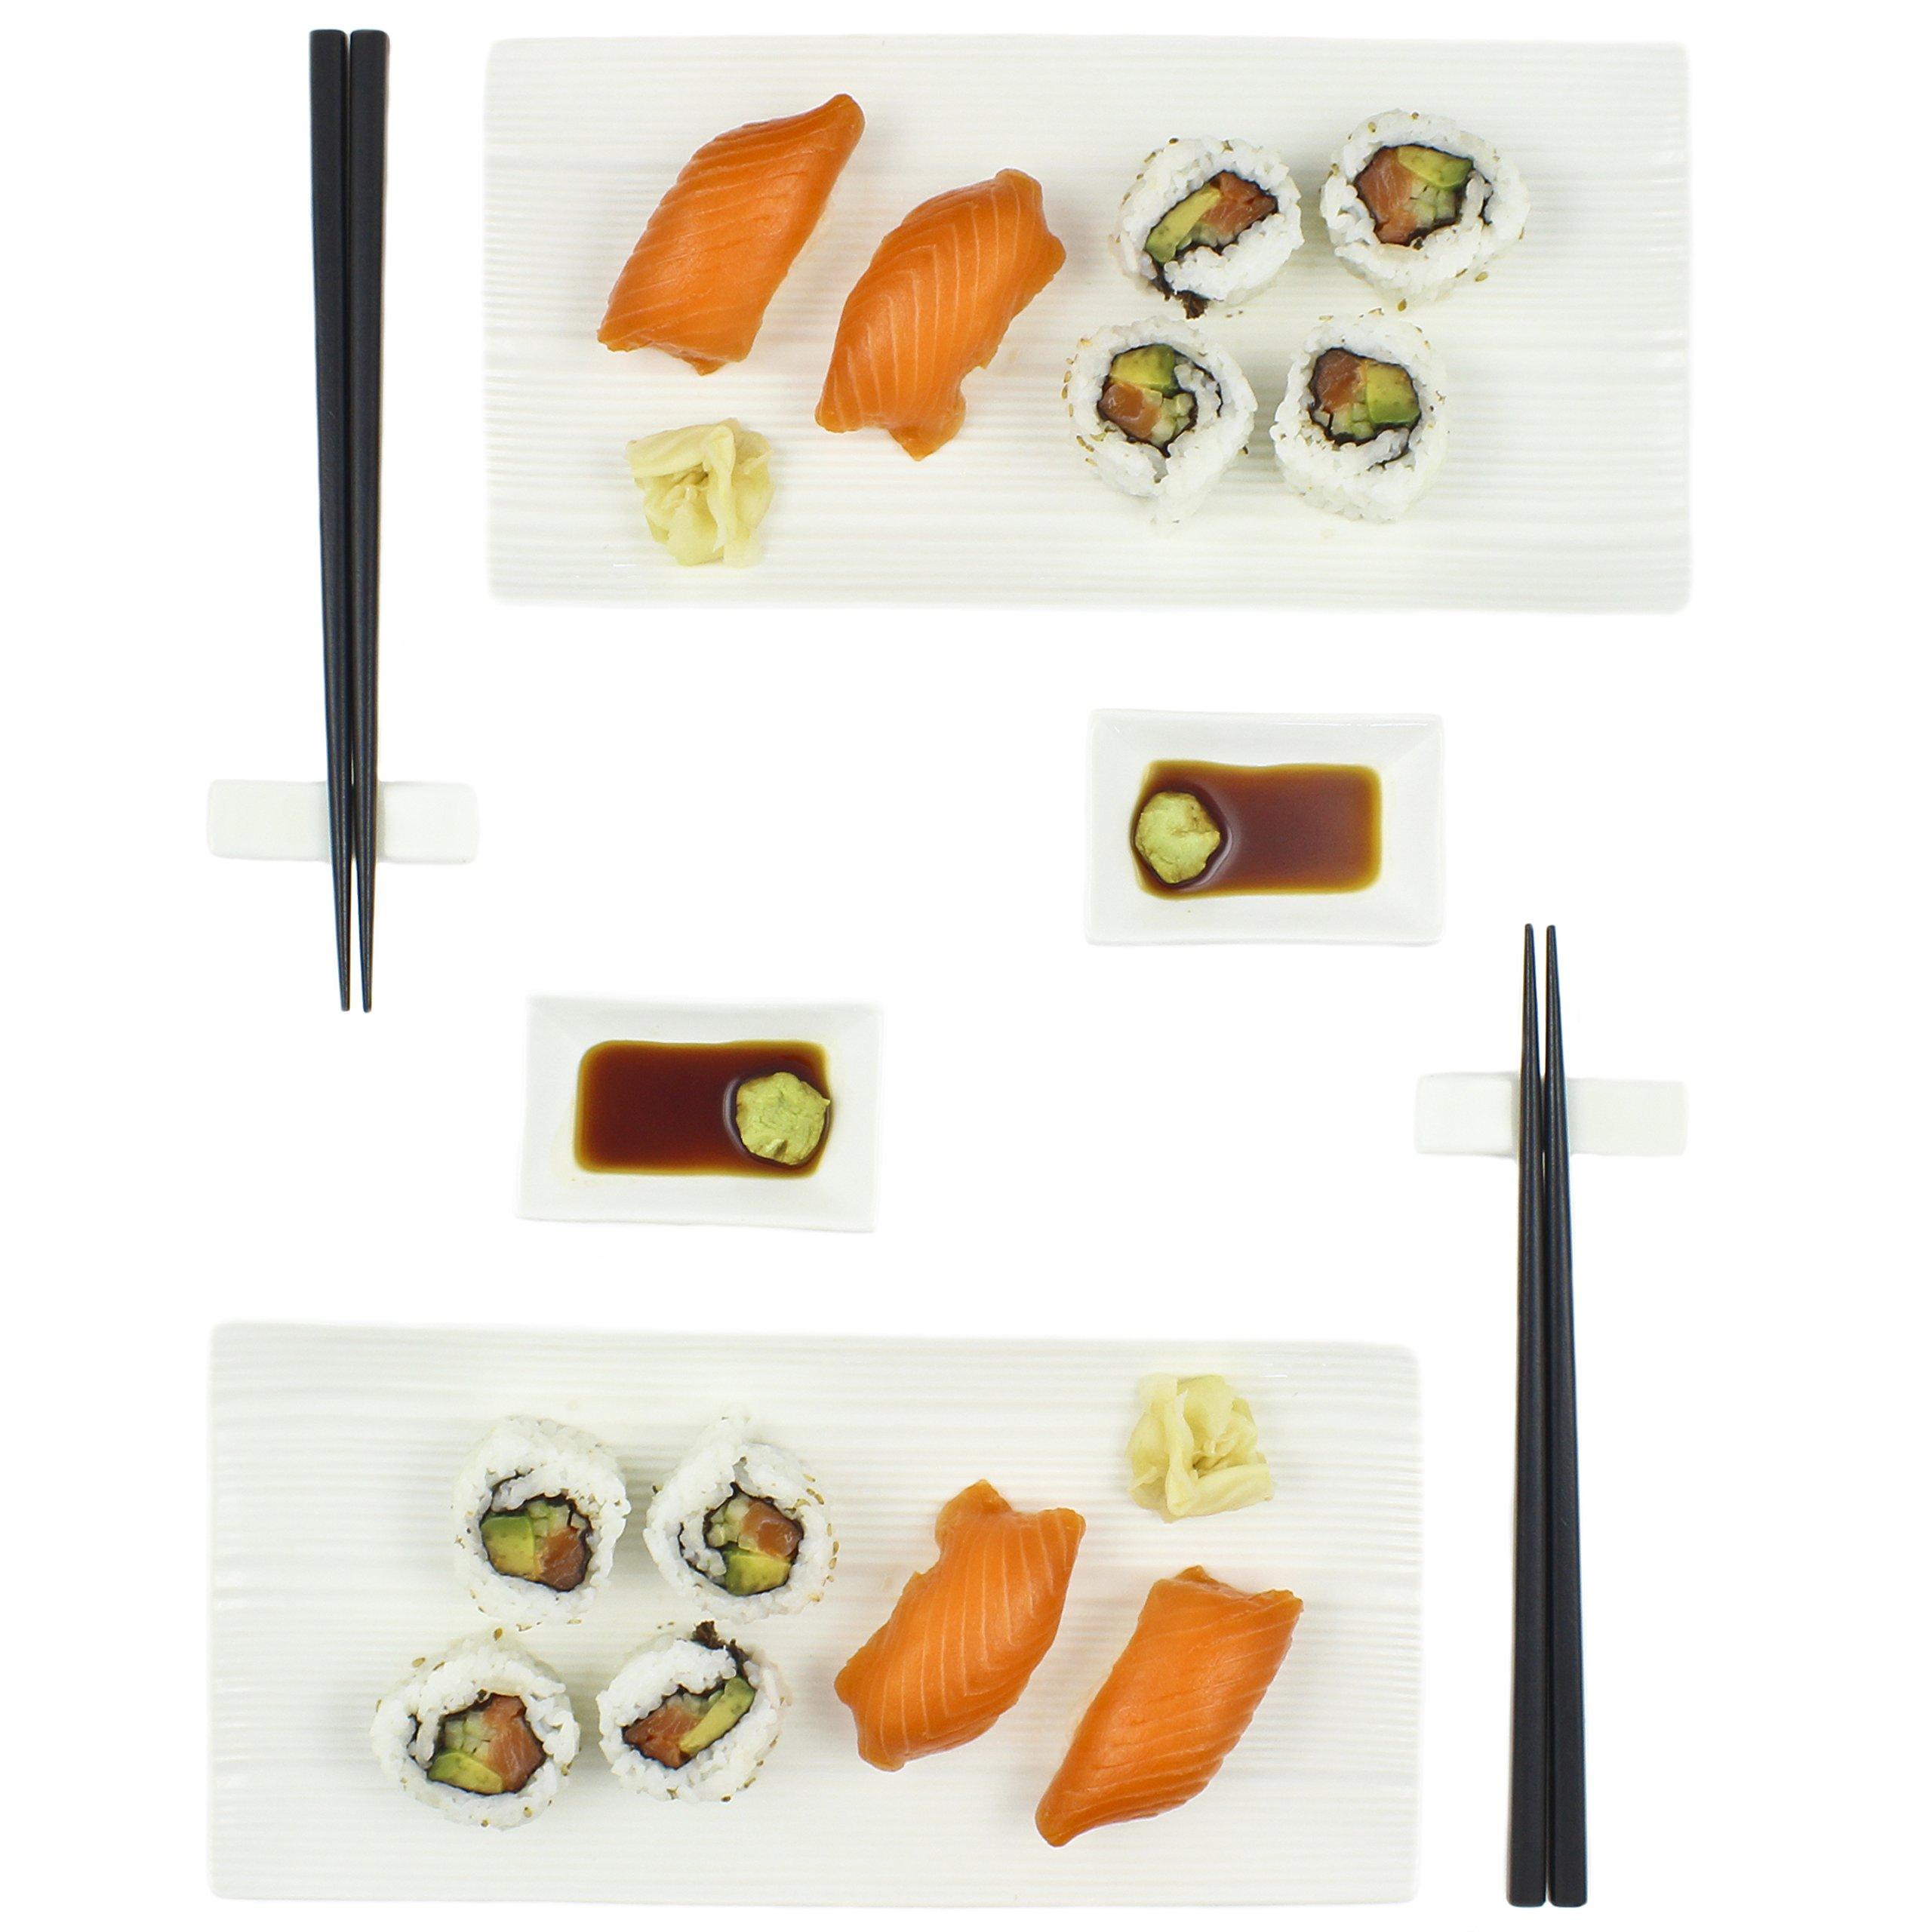 Zoie + Chloe Ceramic Sushi Gift Set For Two